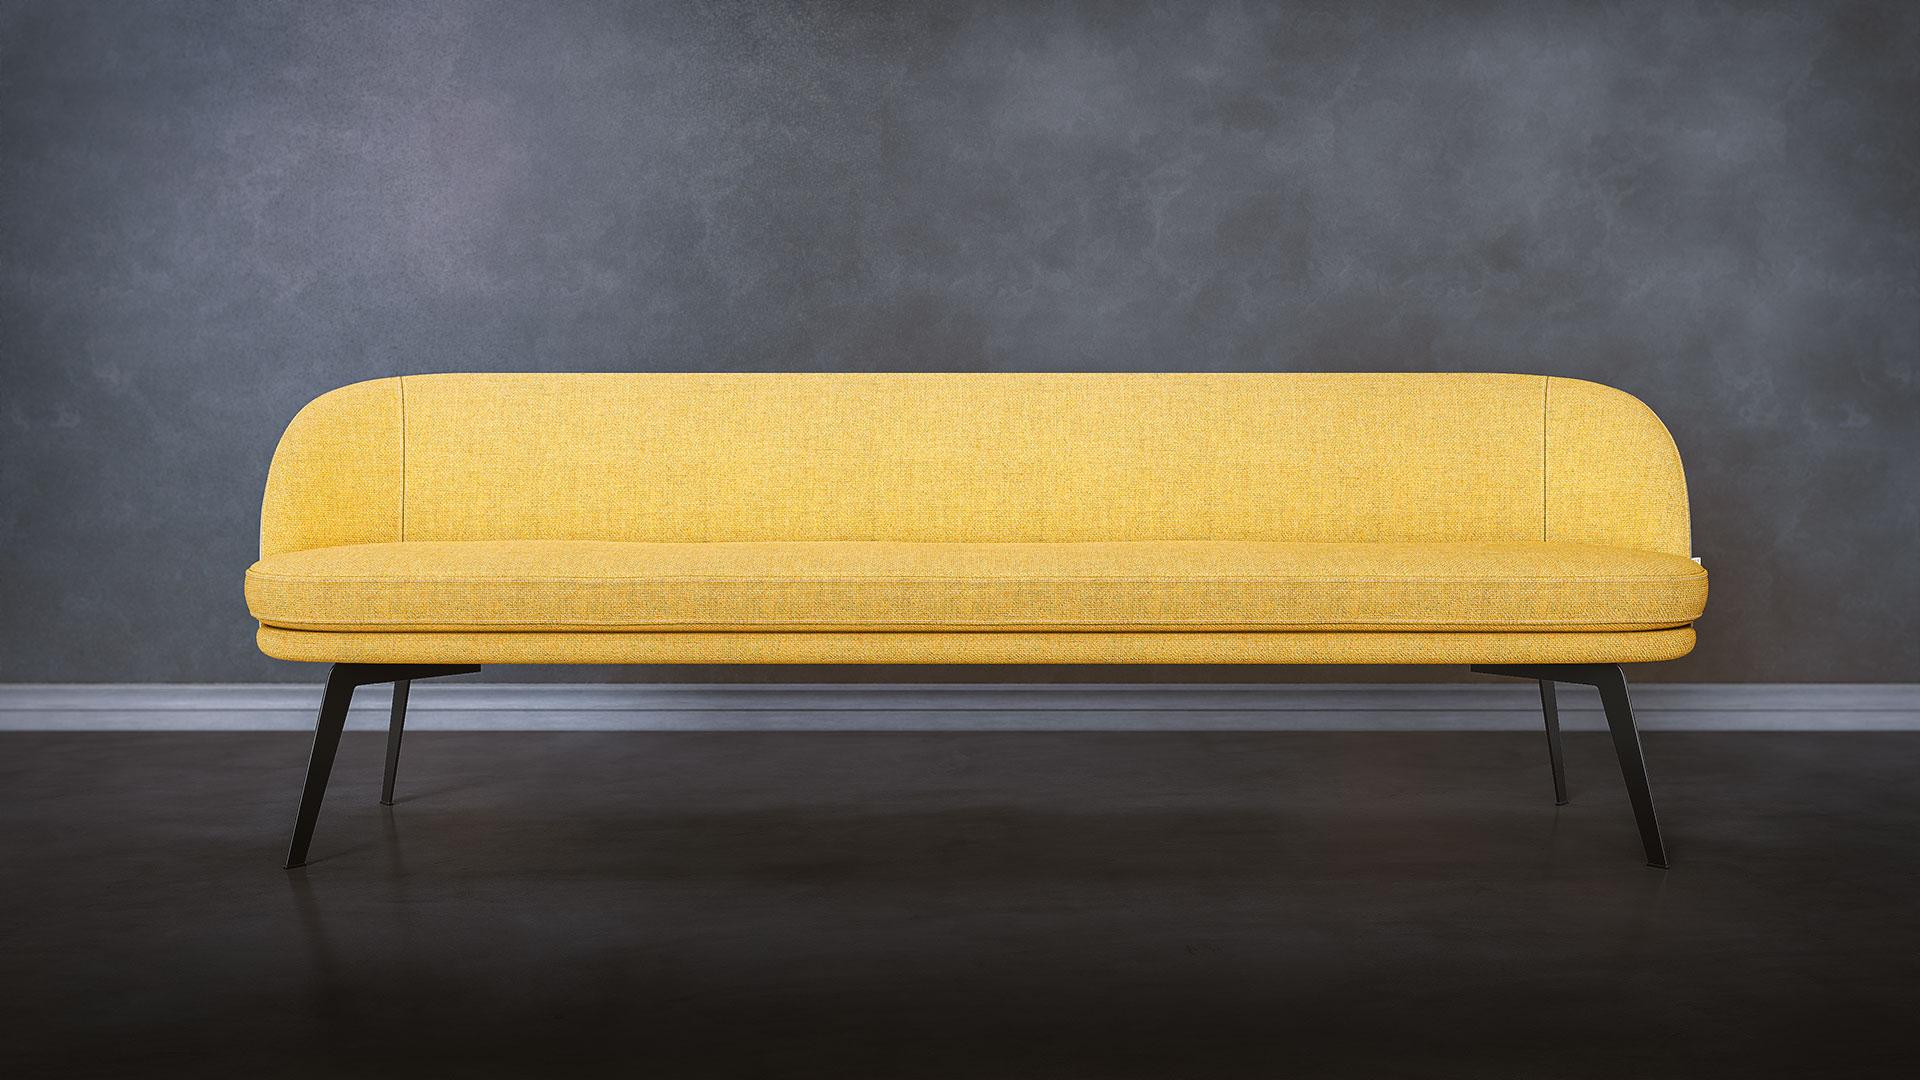 Yellow Bench Product Marketing Image